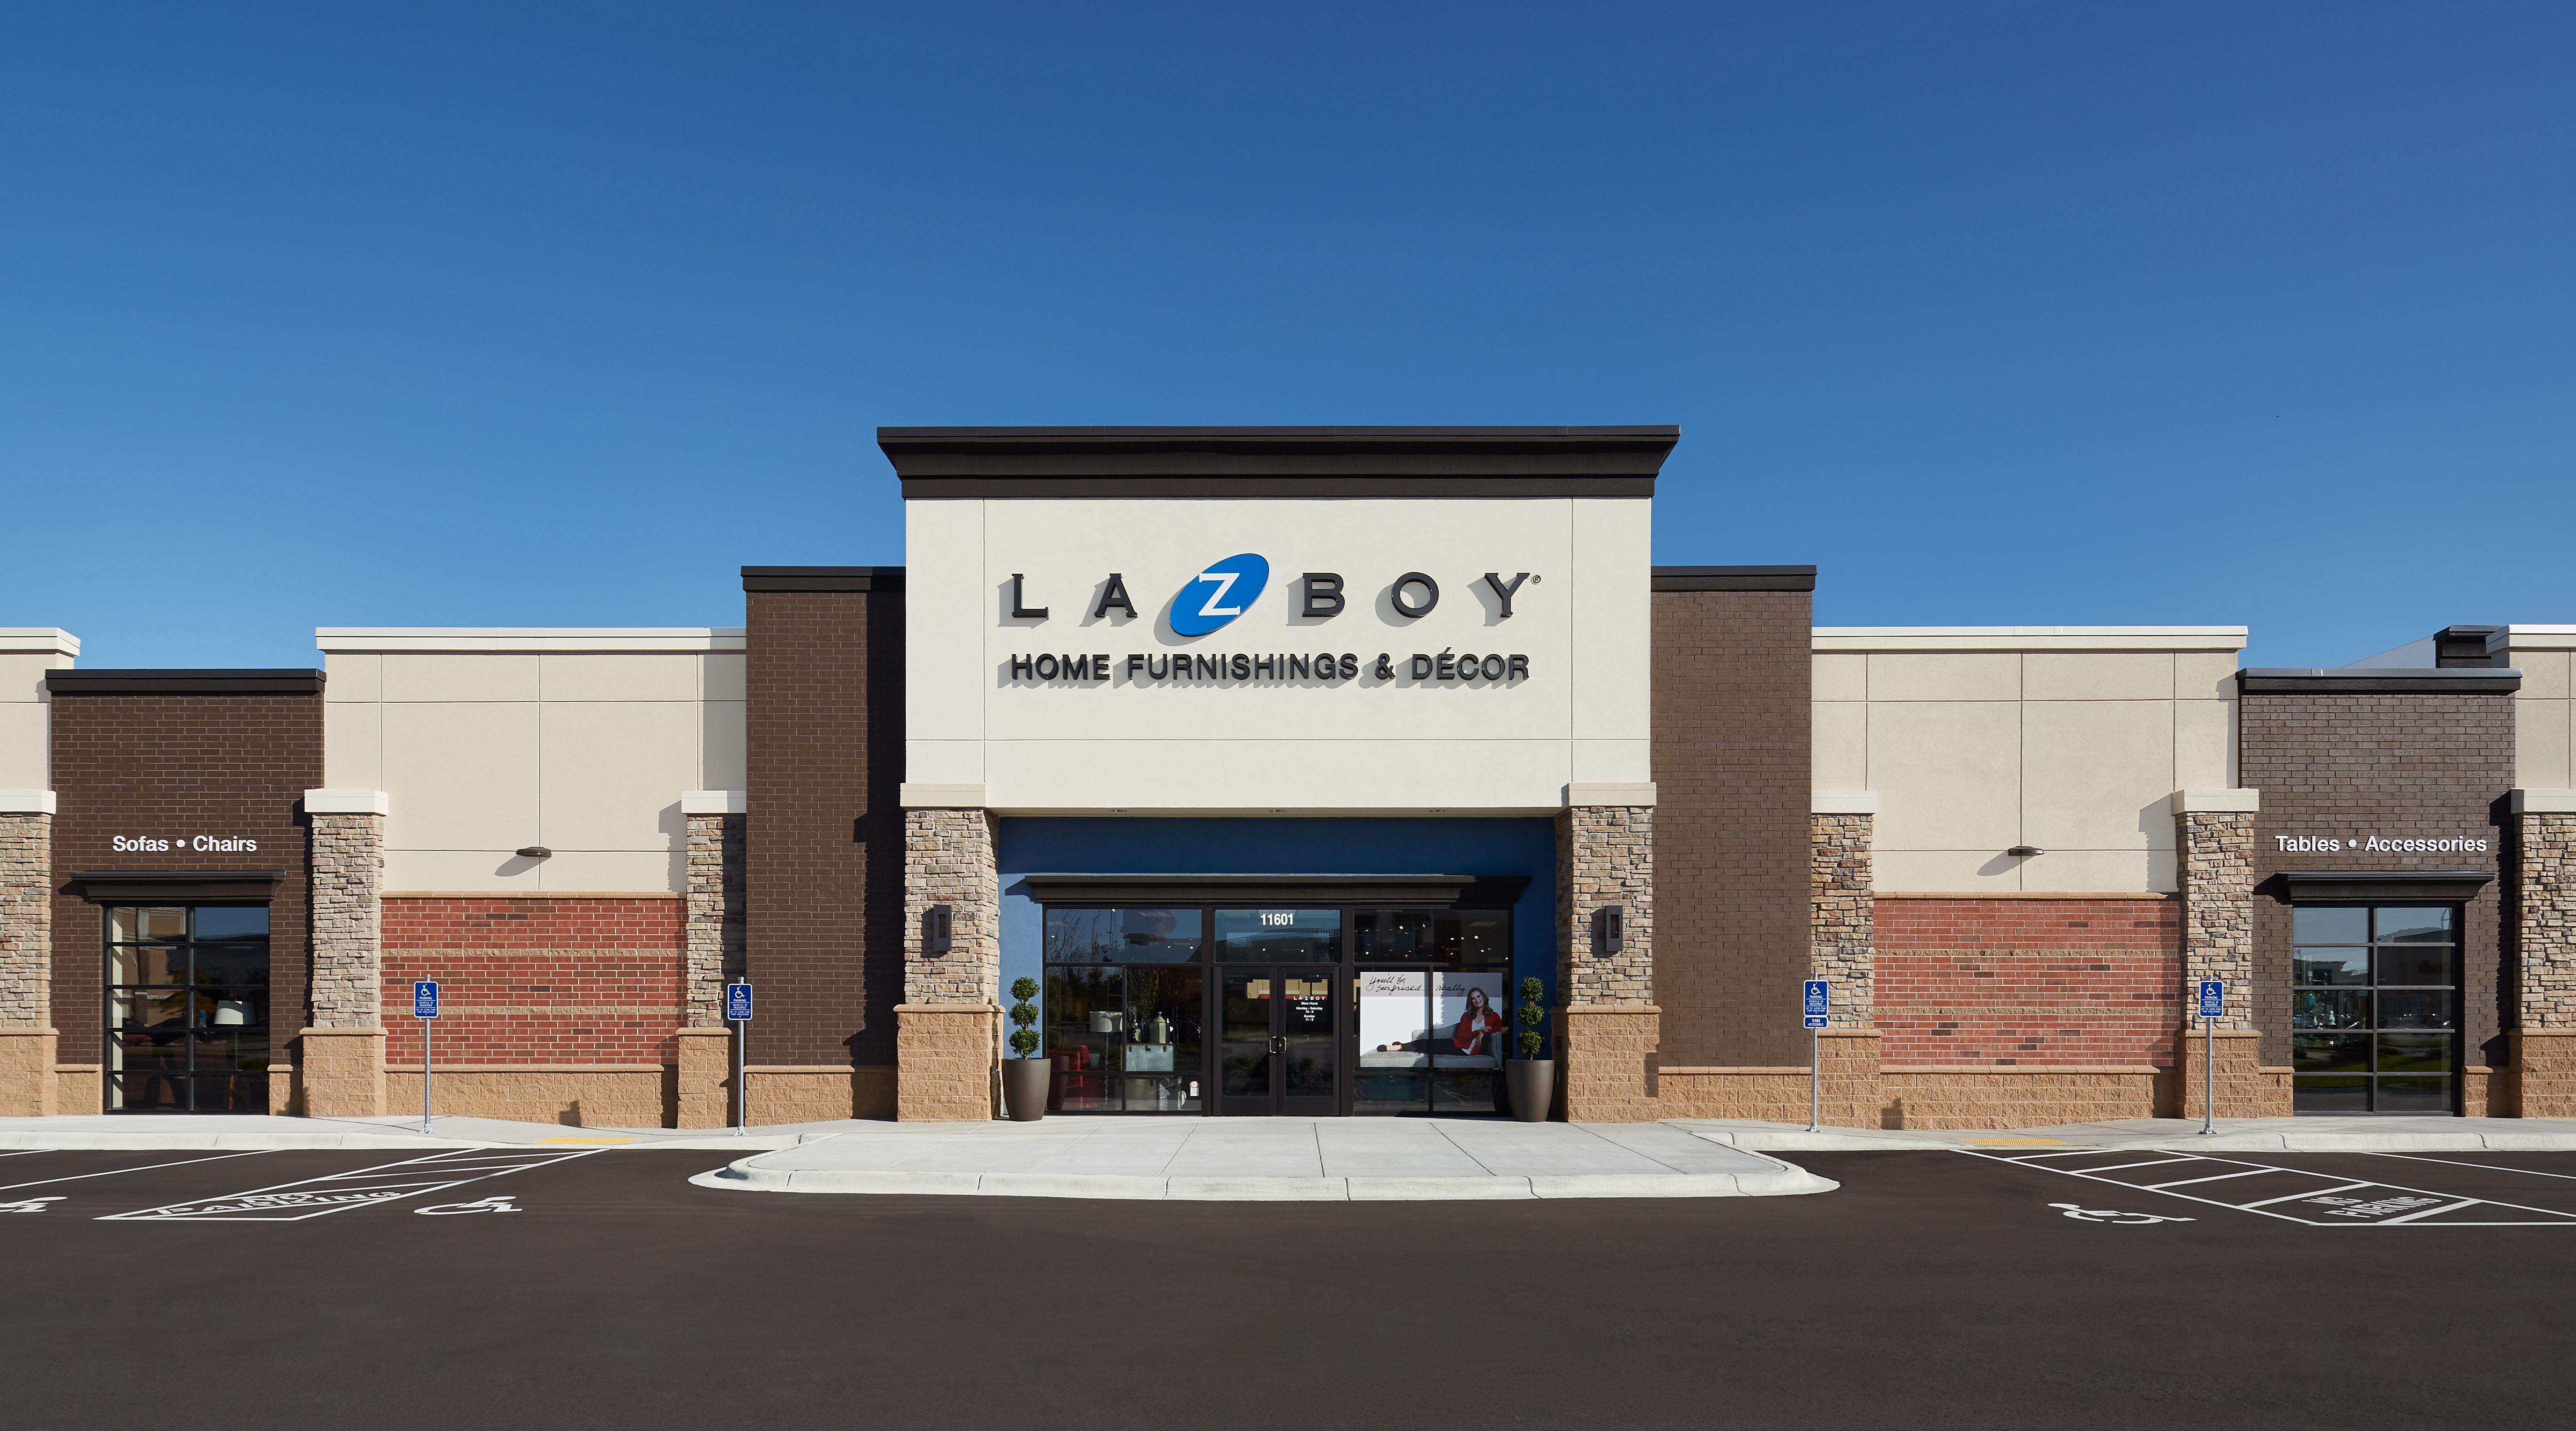 LA-Z-BOY TO BUILD STORE IN OHIO - Media Group Online